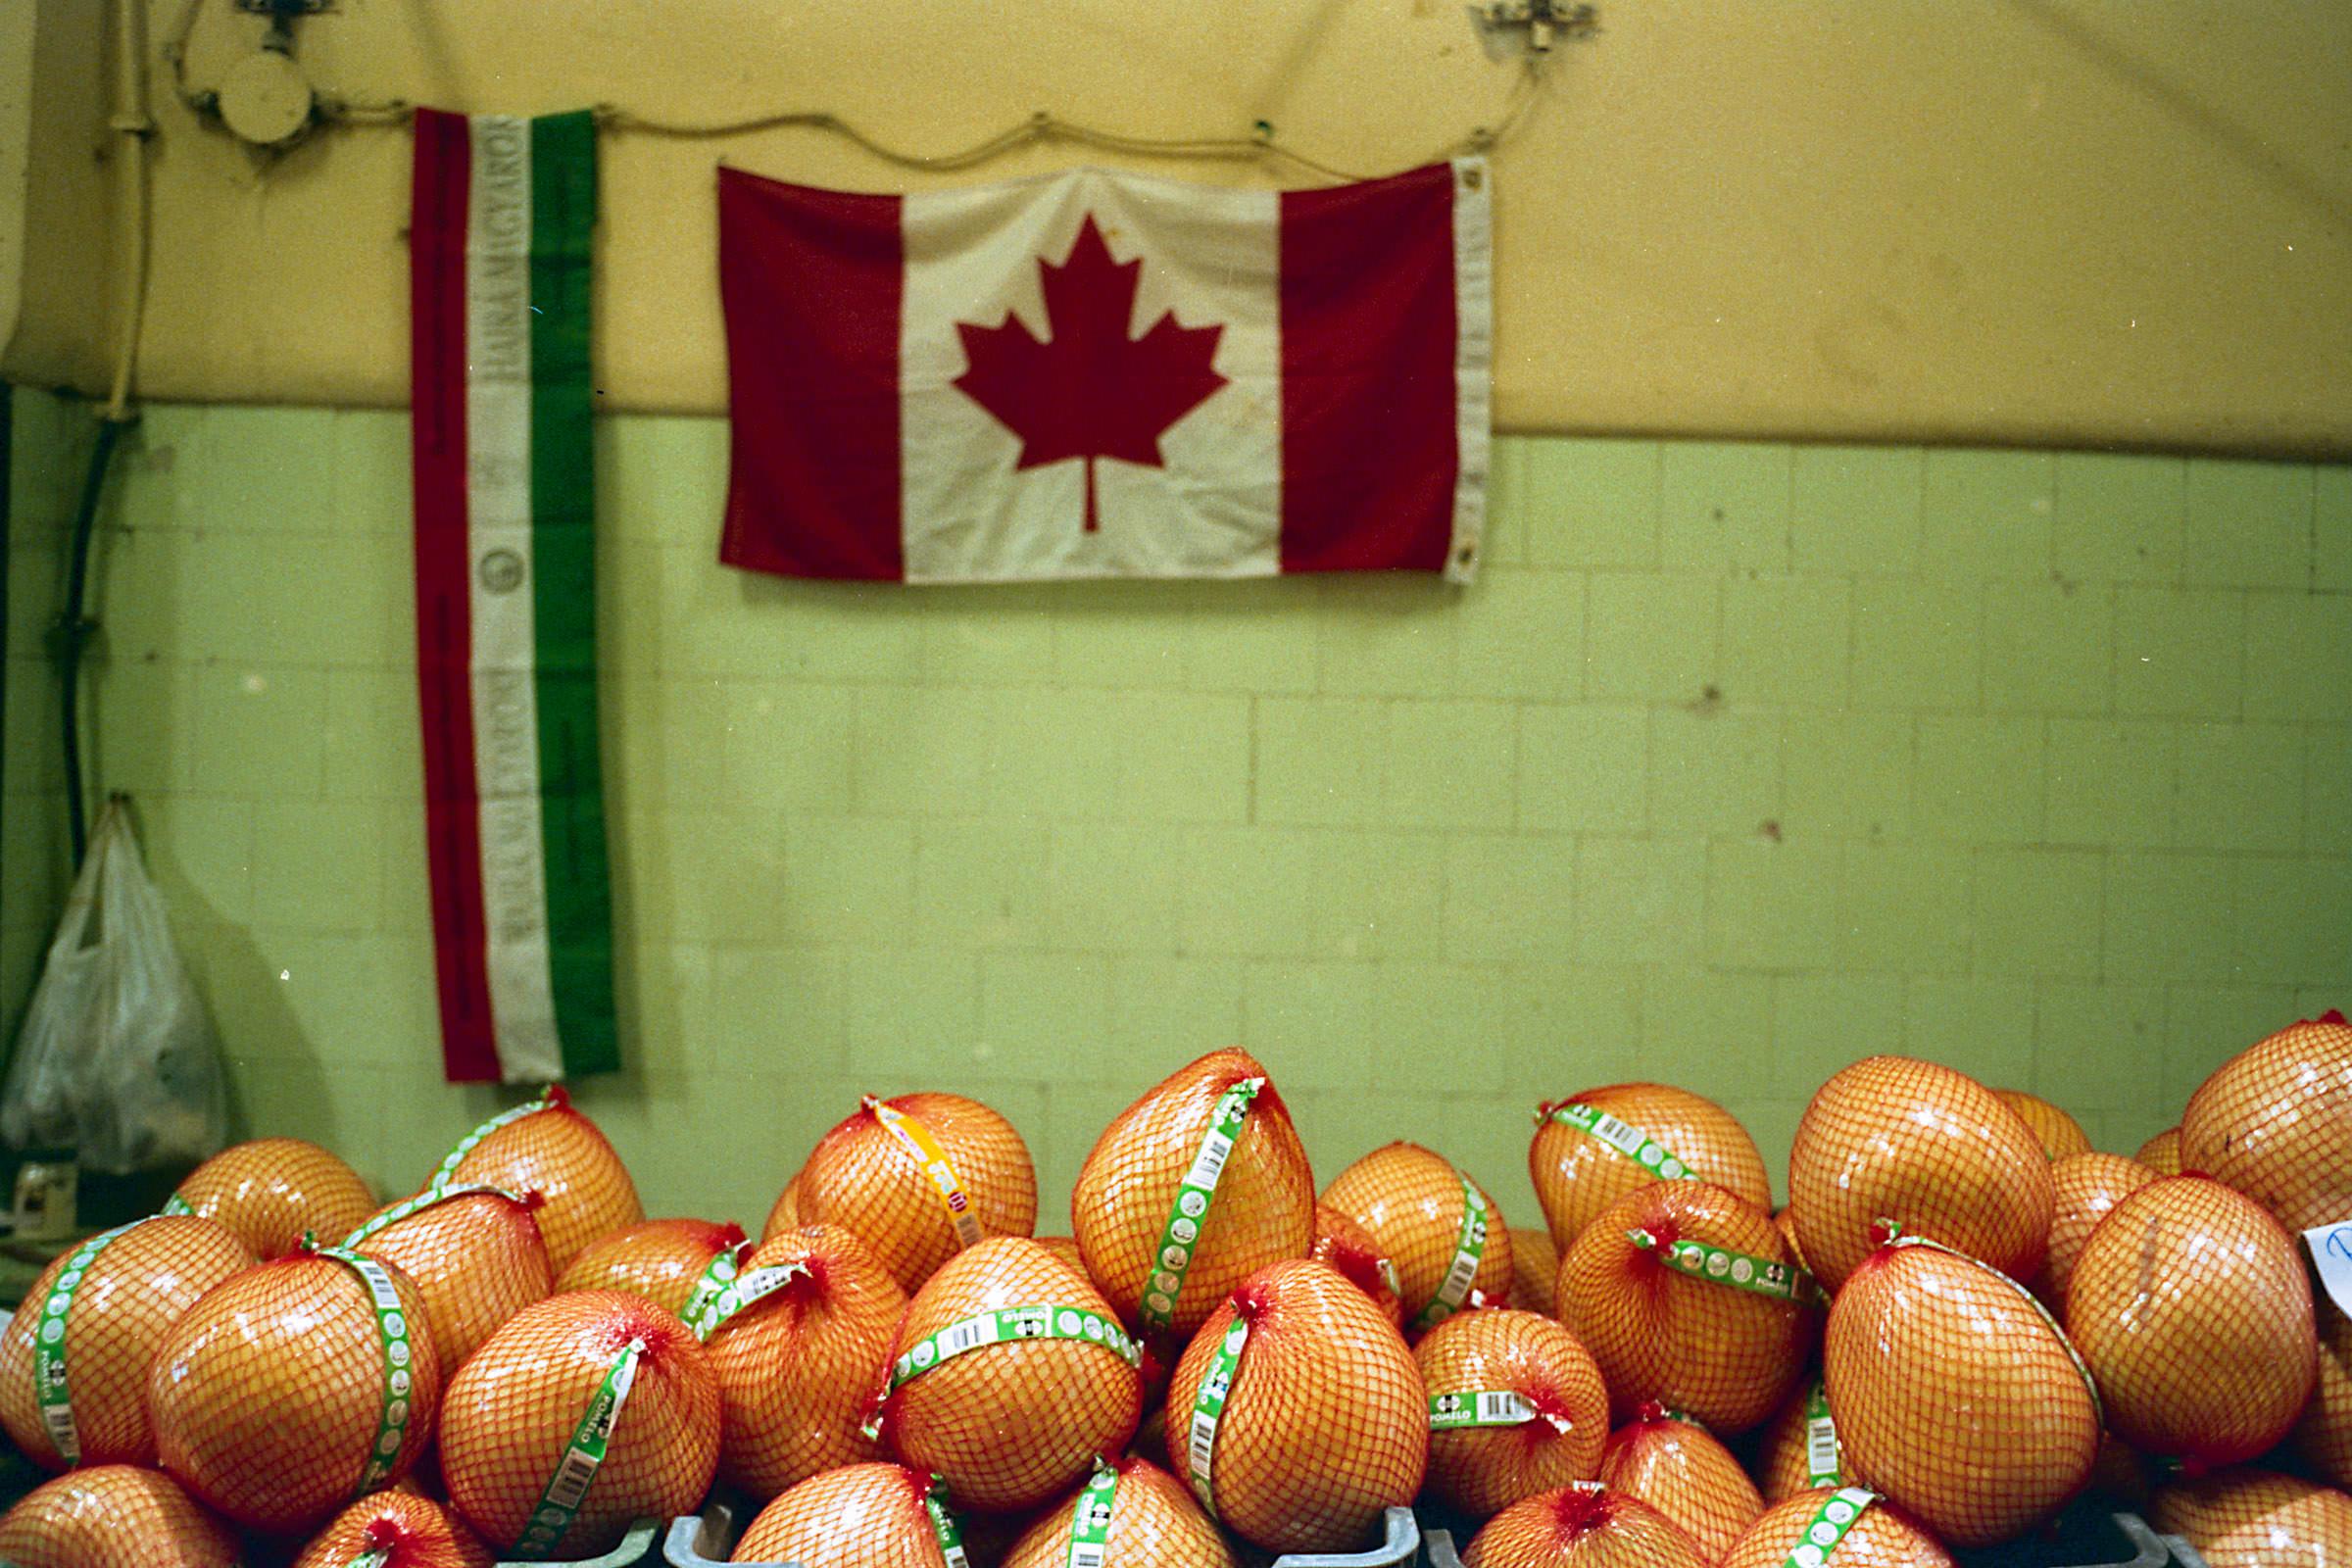 Magócsi Márton: Budapest, kanadai pomeló | Budapest, Canadian Pomelo, 2016